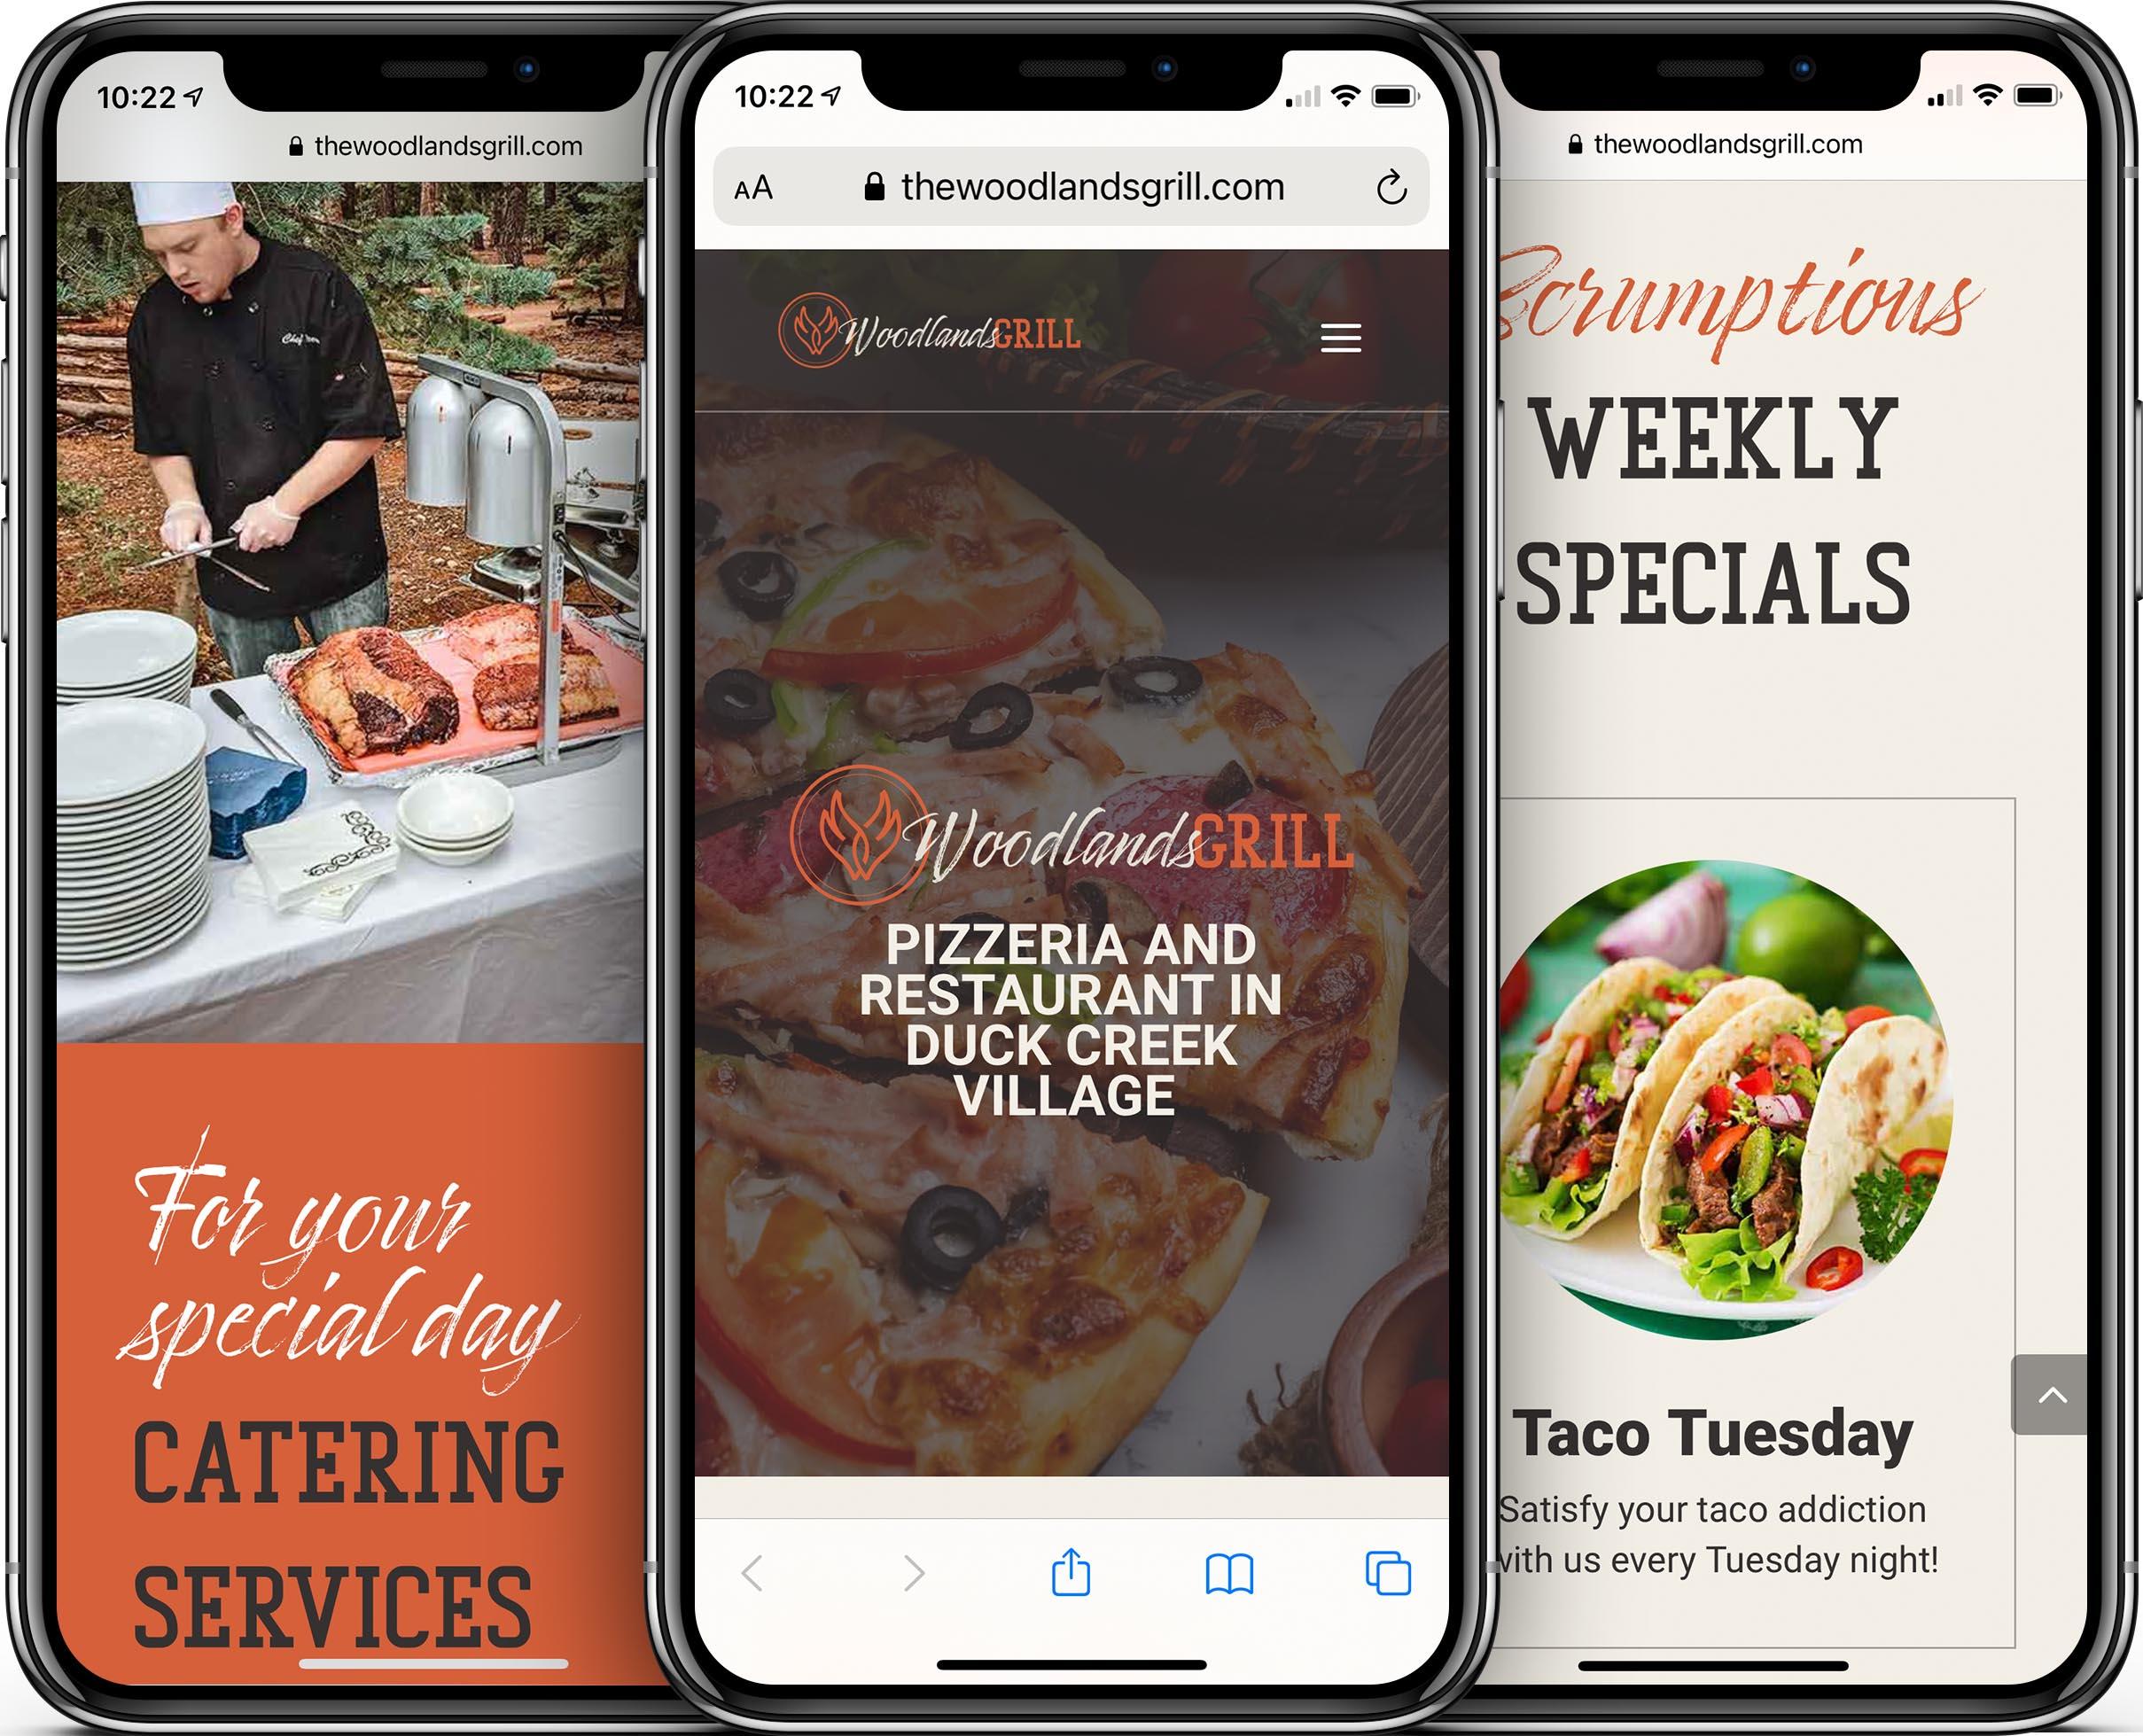 Woodlands Grill Mobile-Friendly Web Design